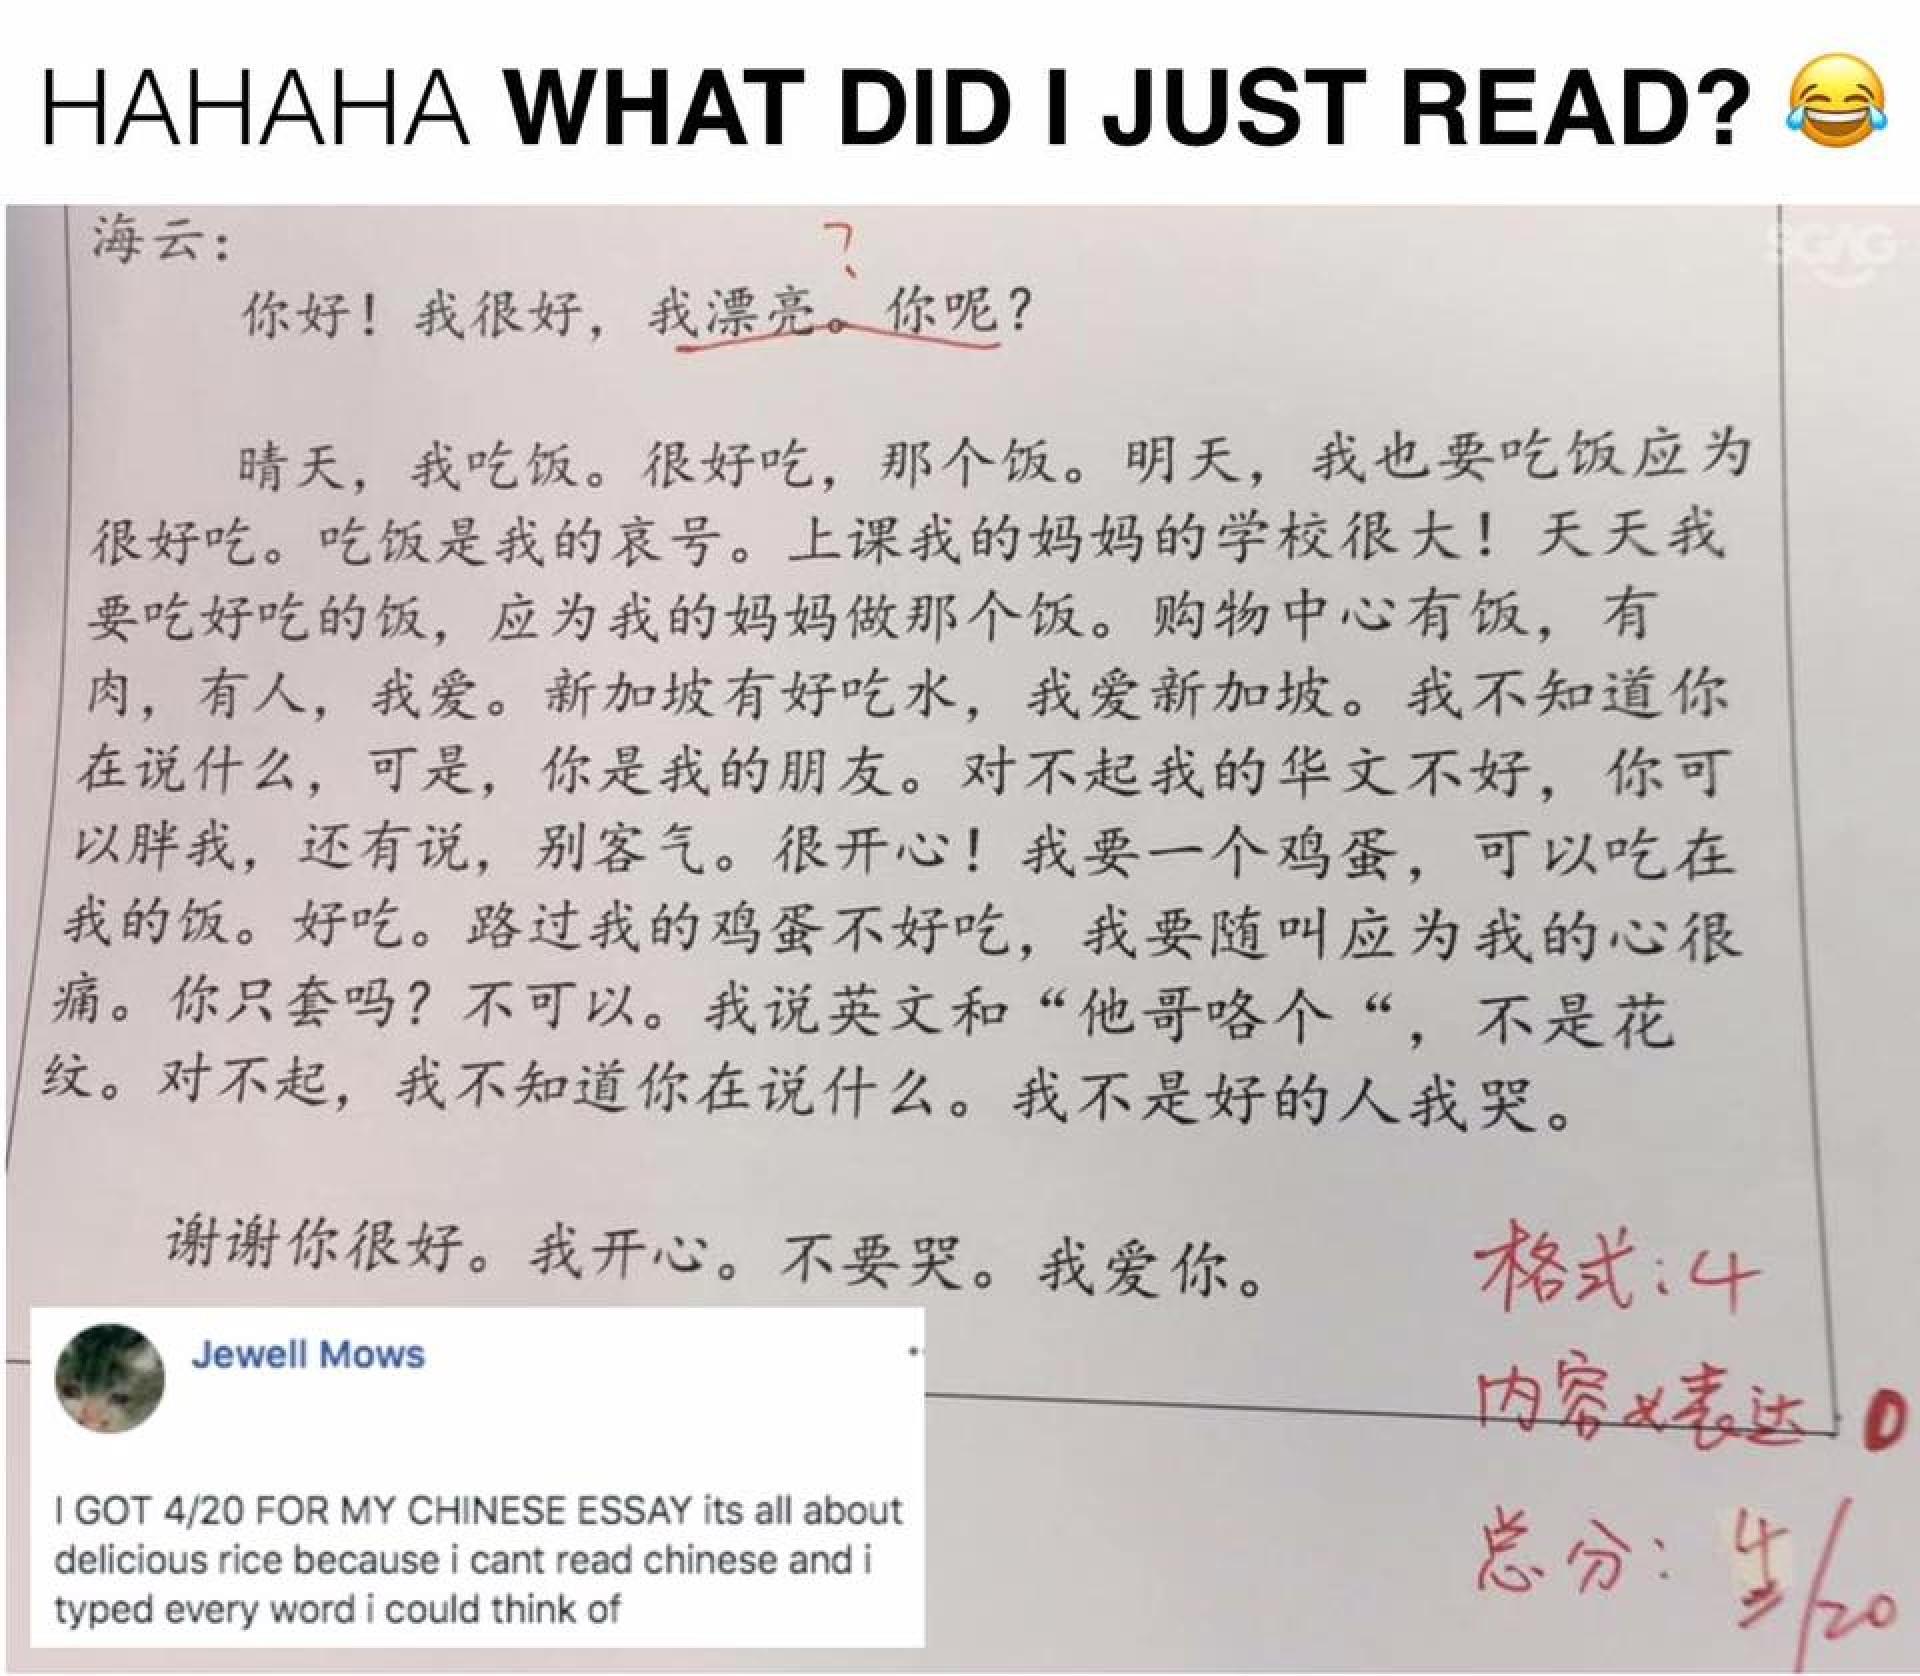 007 449y258ku5921 Essay Example Amazing Chinese Art Topics Vce Formats Sheet 1920